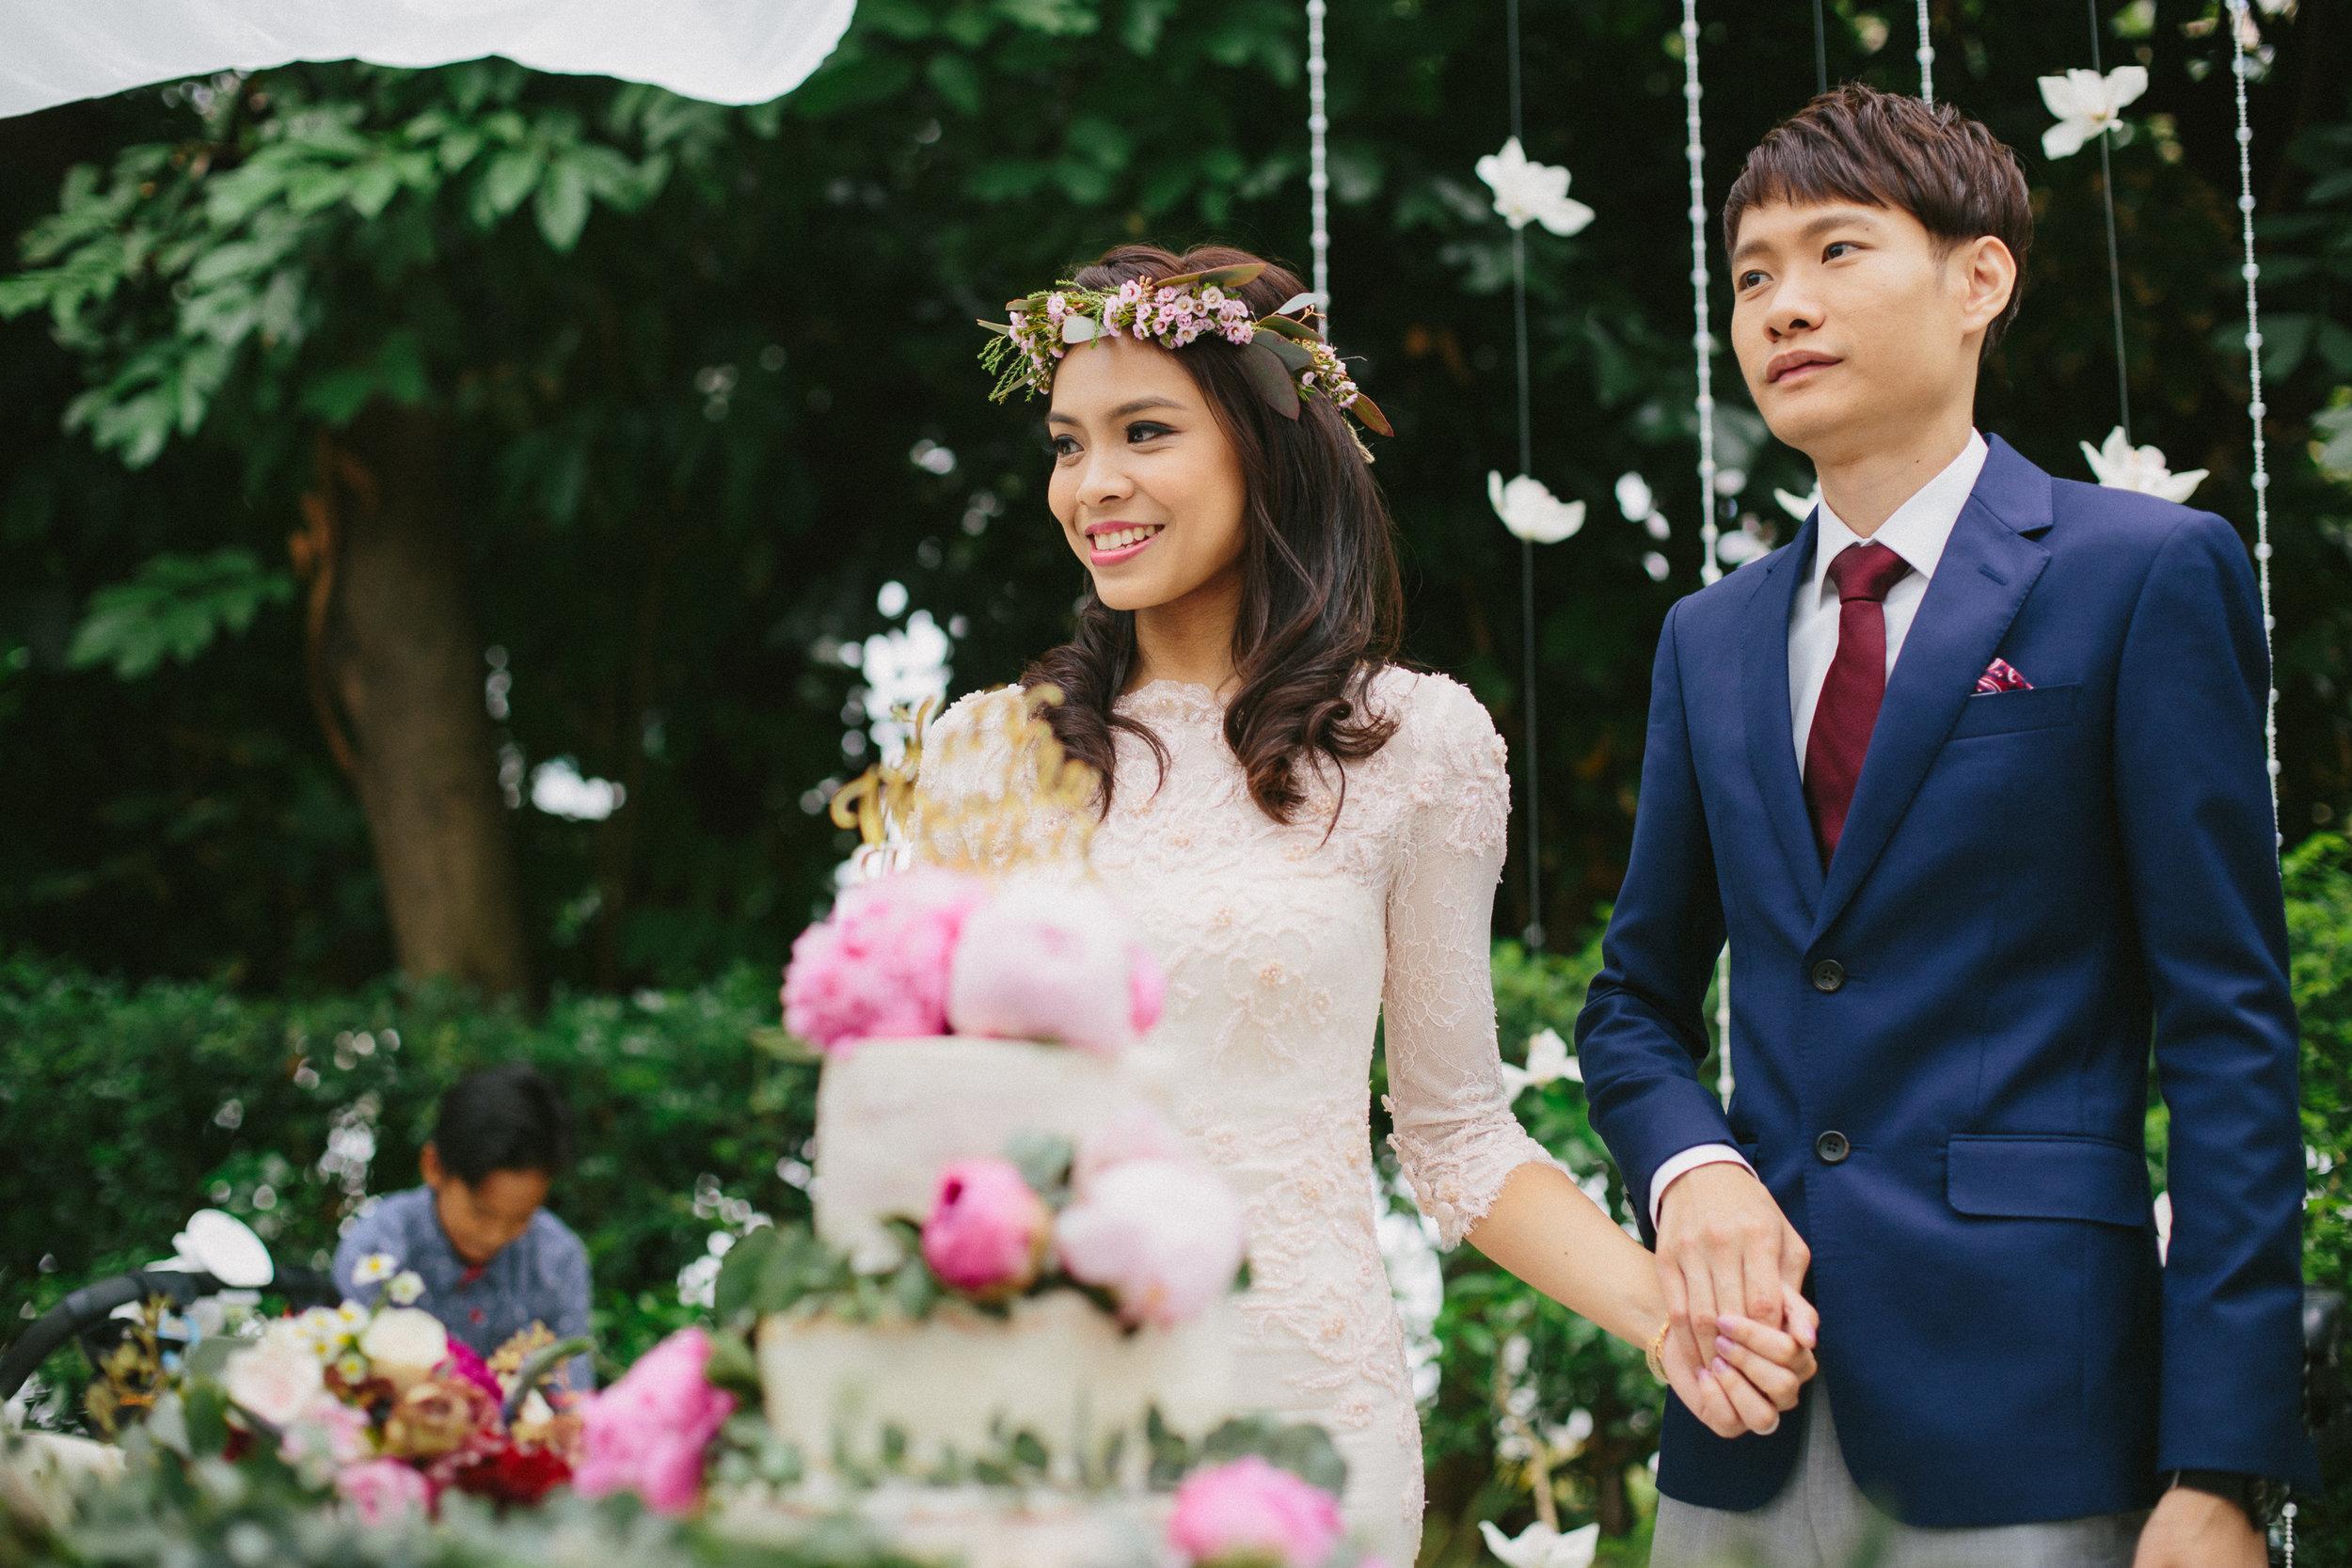 singapore-wedding-photographer-fadilah-kwan-061.jpg